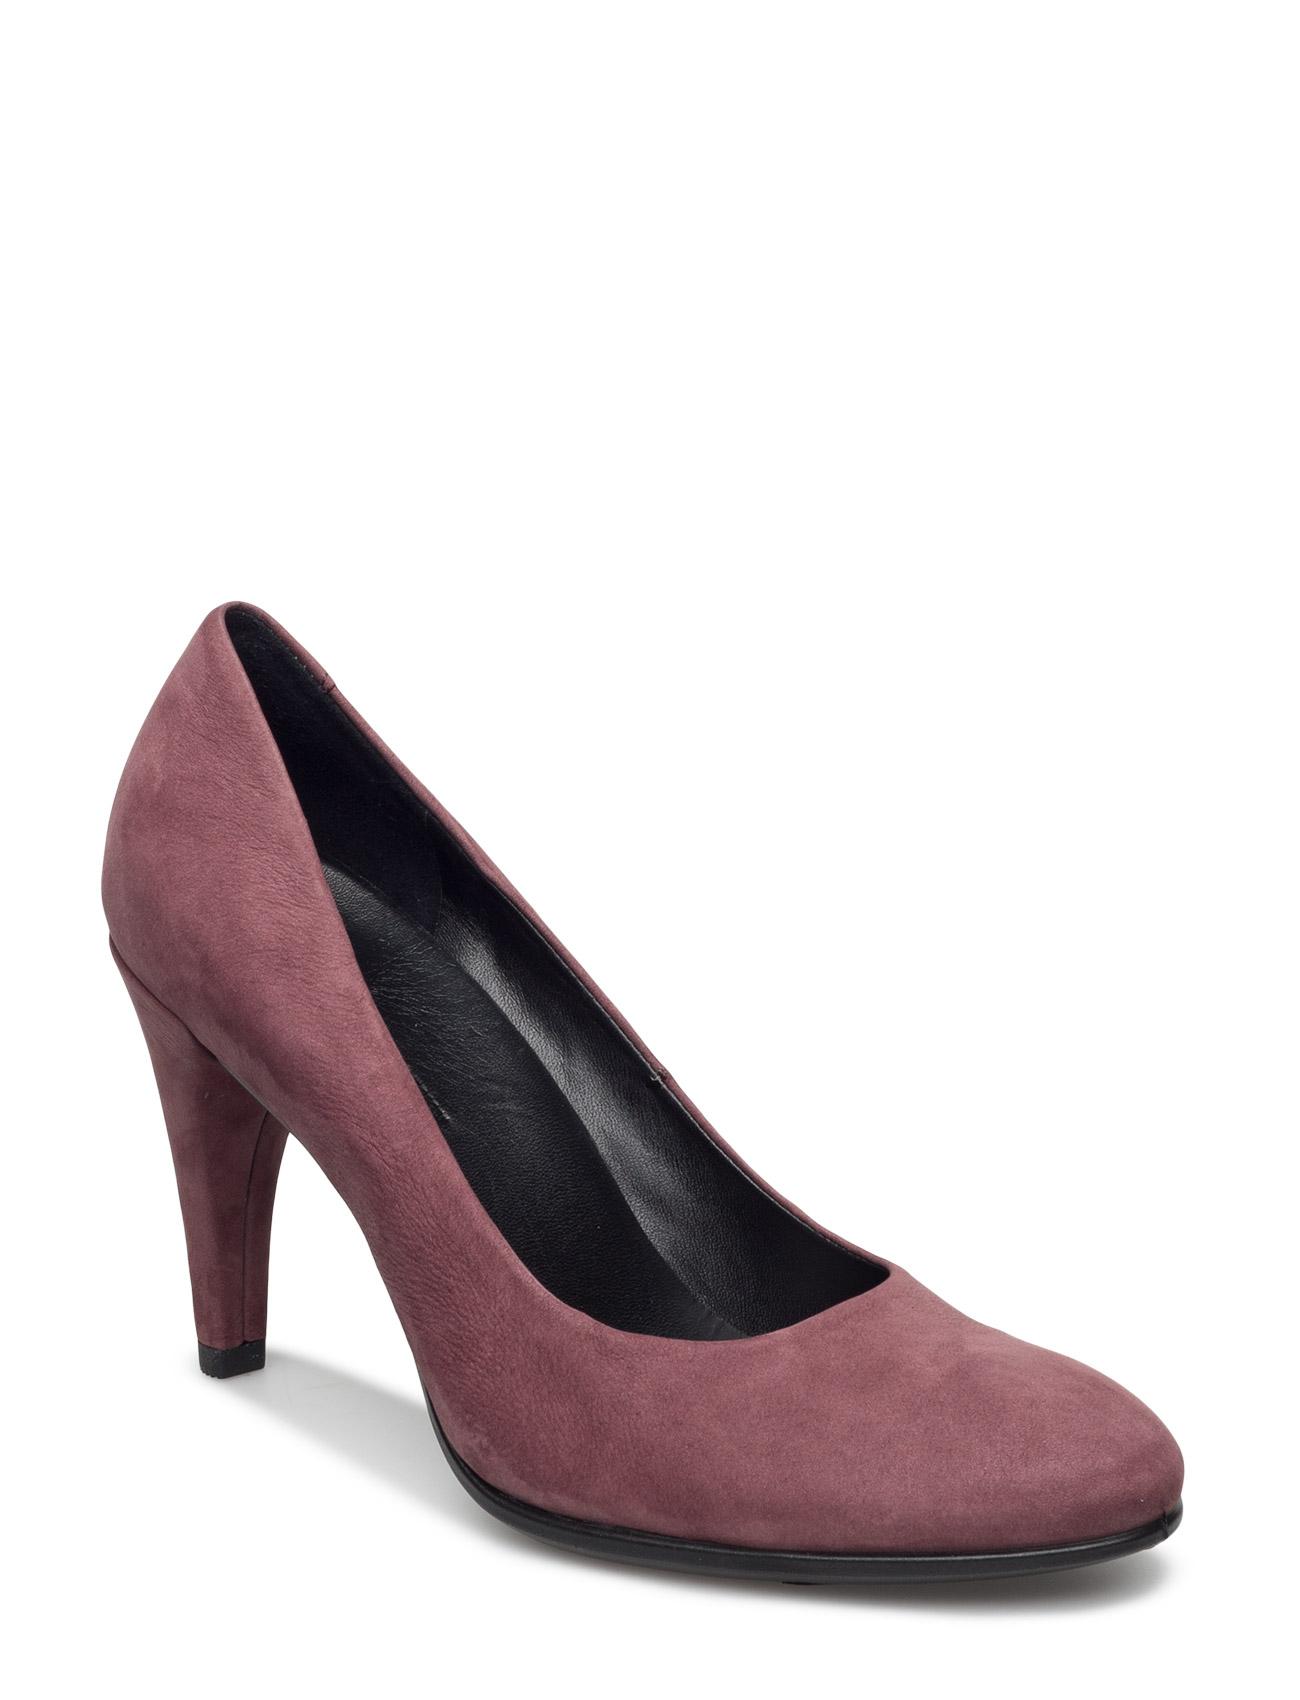 Köpa billiga Shape 75 Sleek online